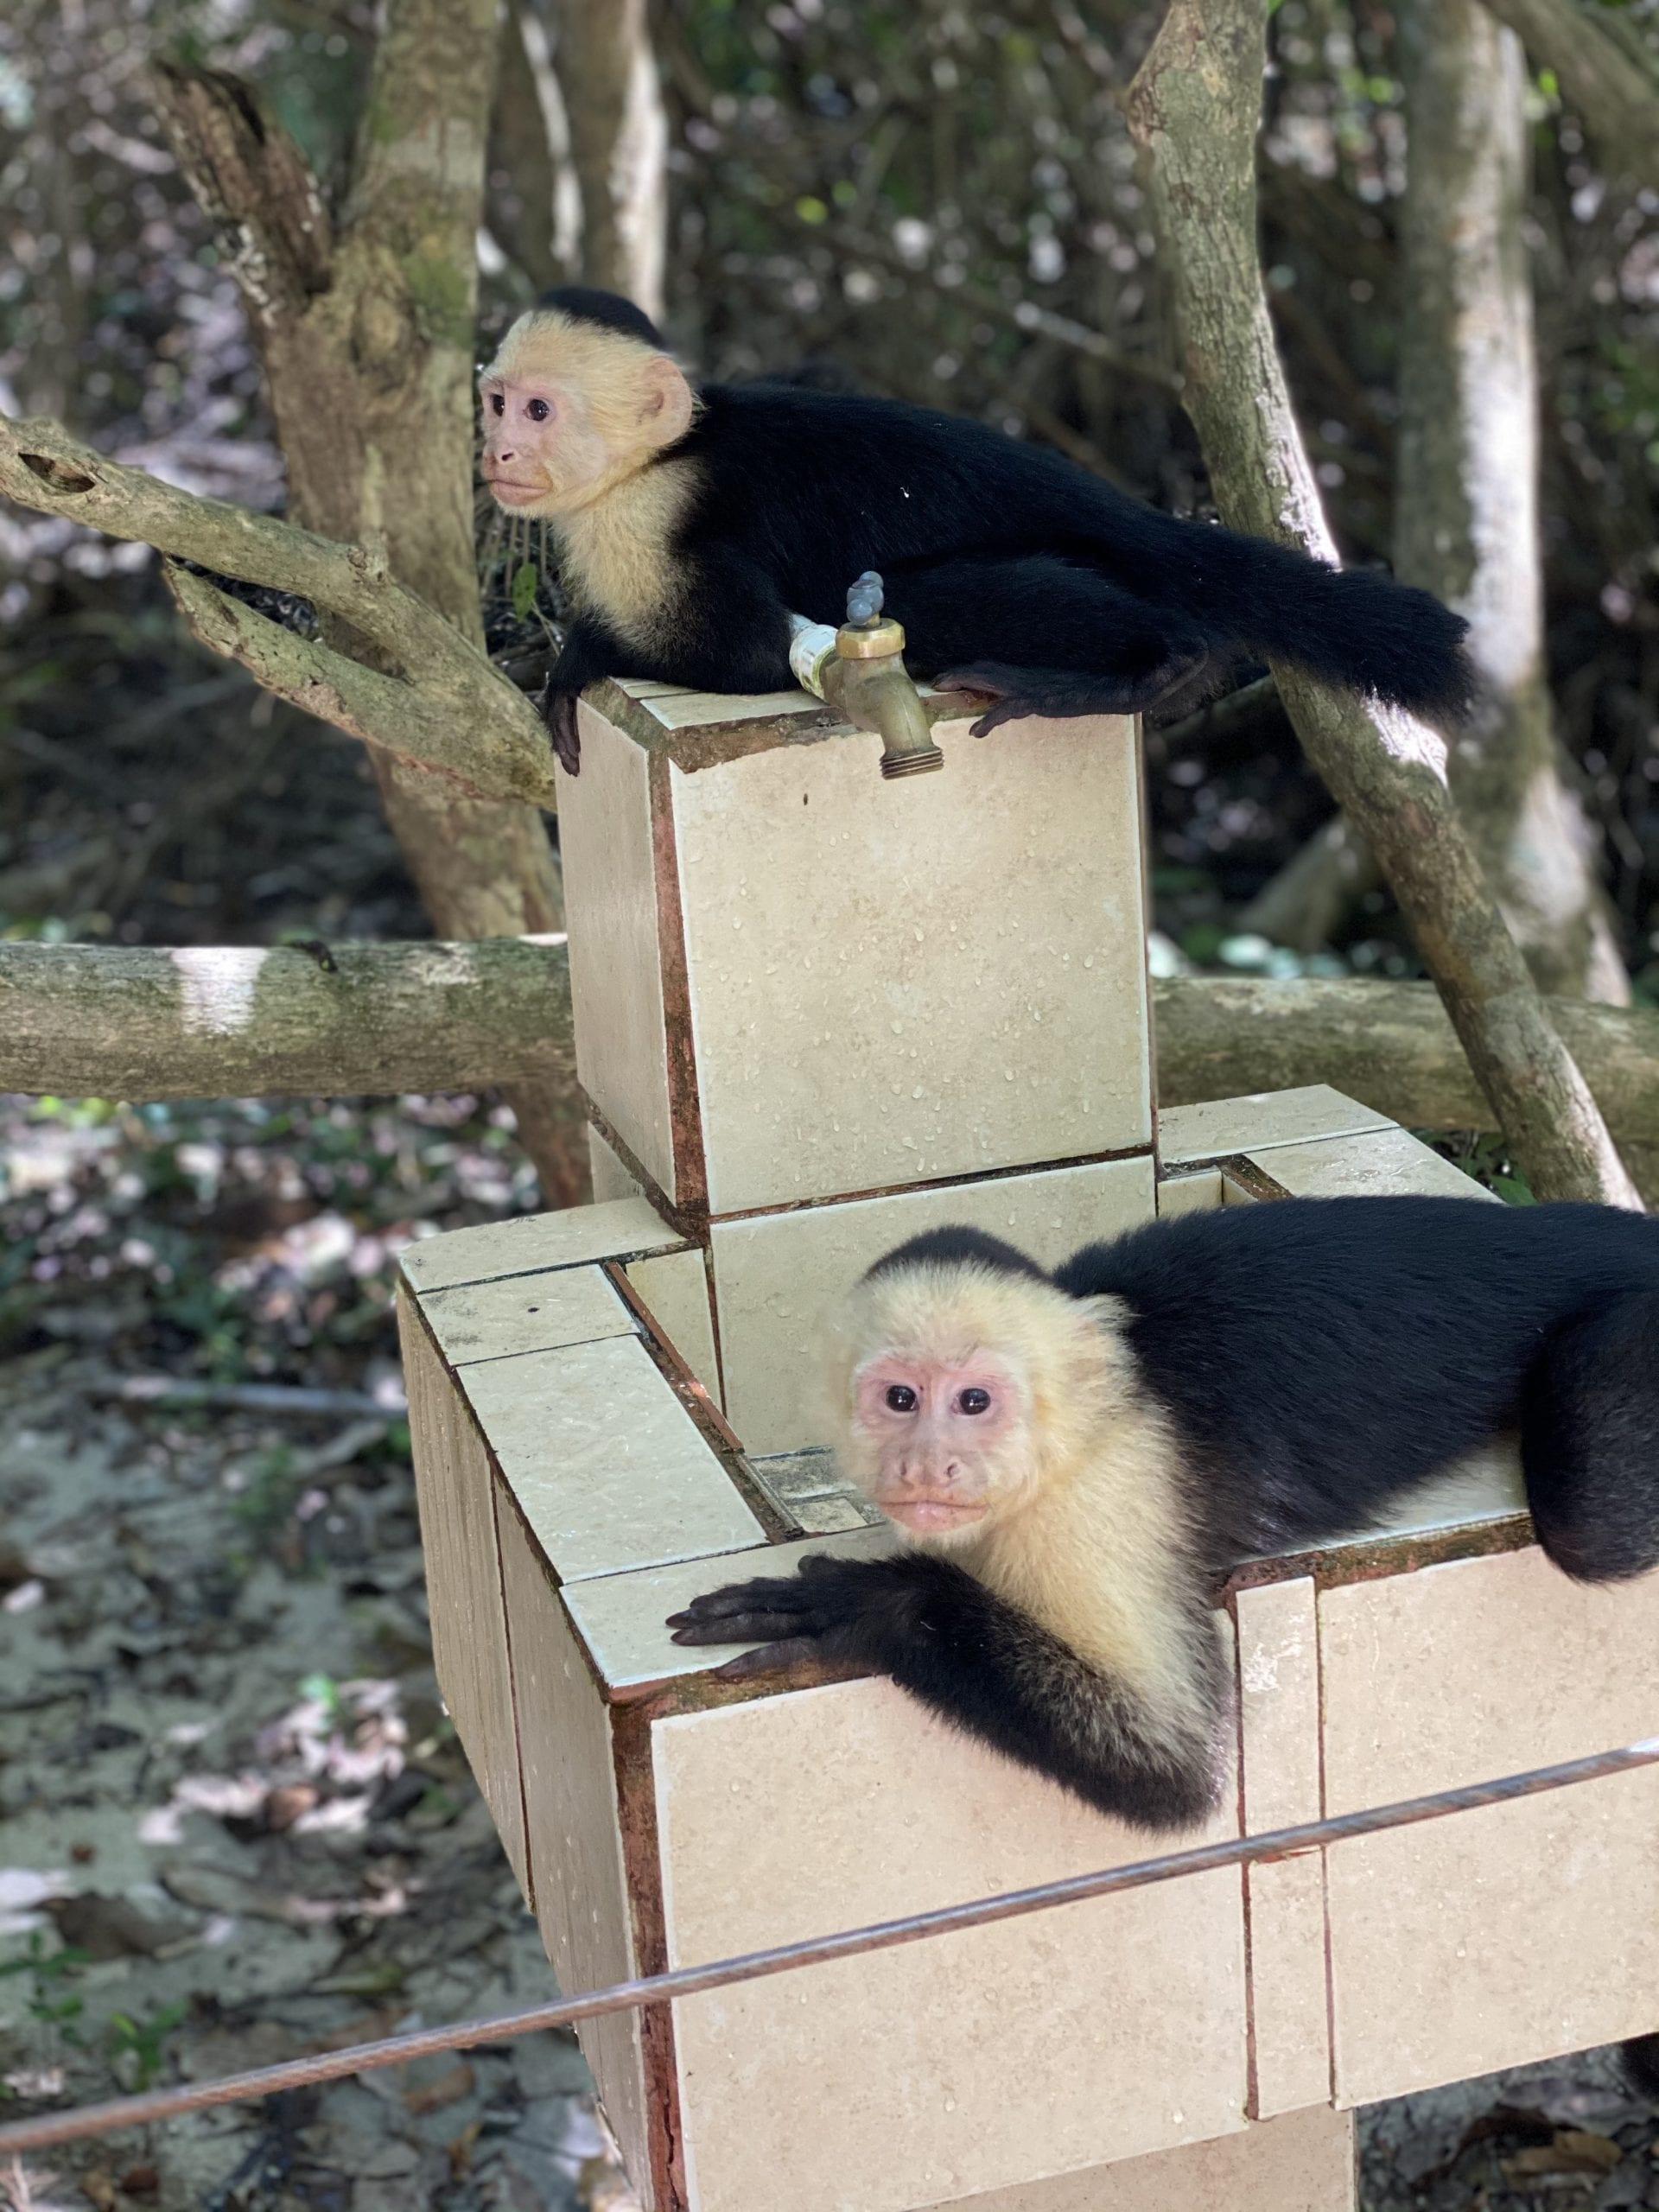 Cute-Monkeys-in-Manuel-Antonio-Costa-Rica